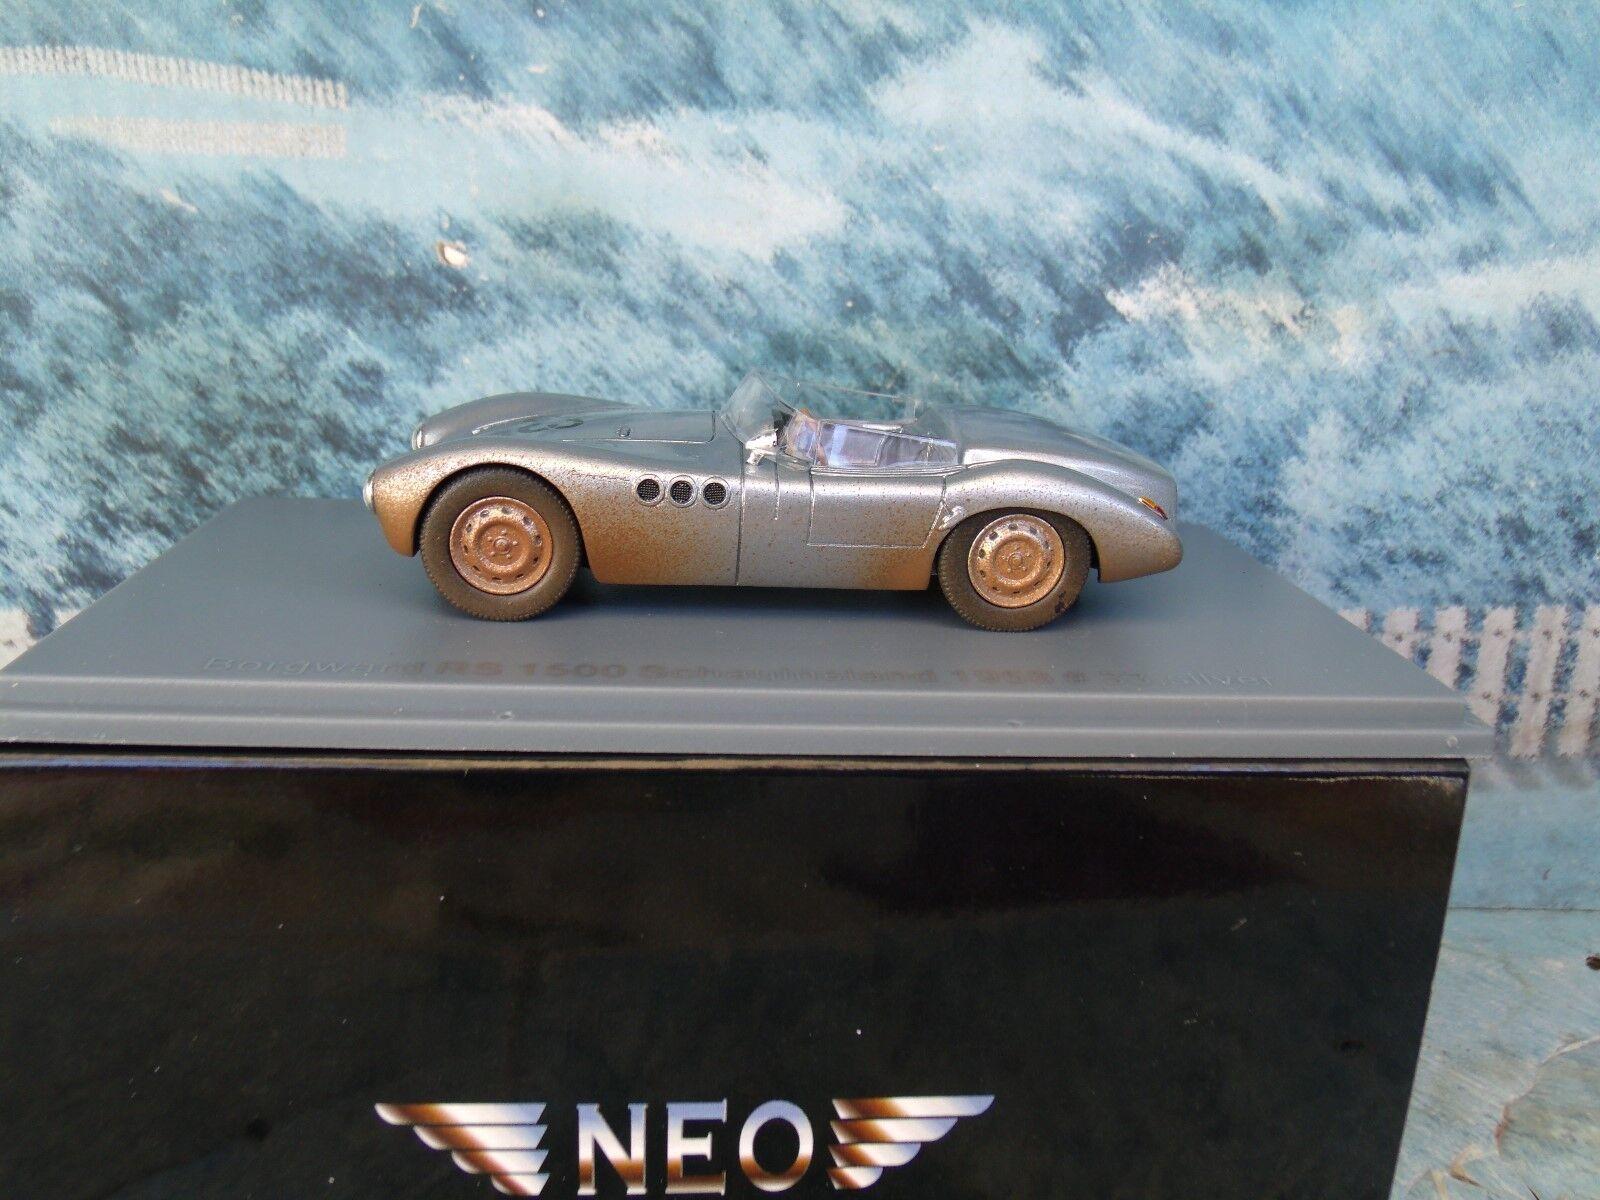 1 43  NEO  BORGWARD RS 1500, Schauinsland 1958